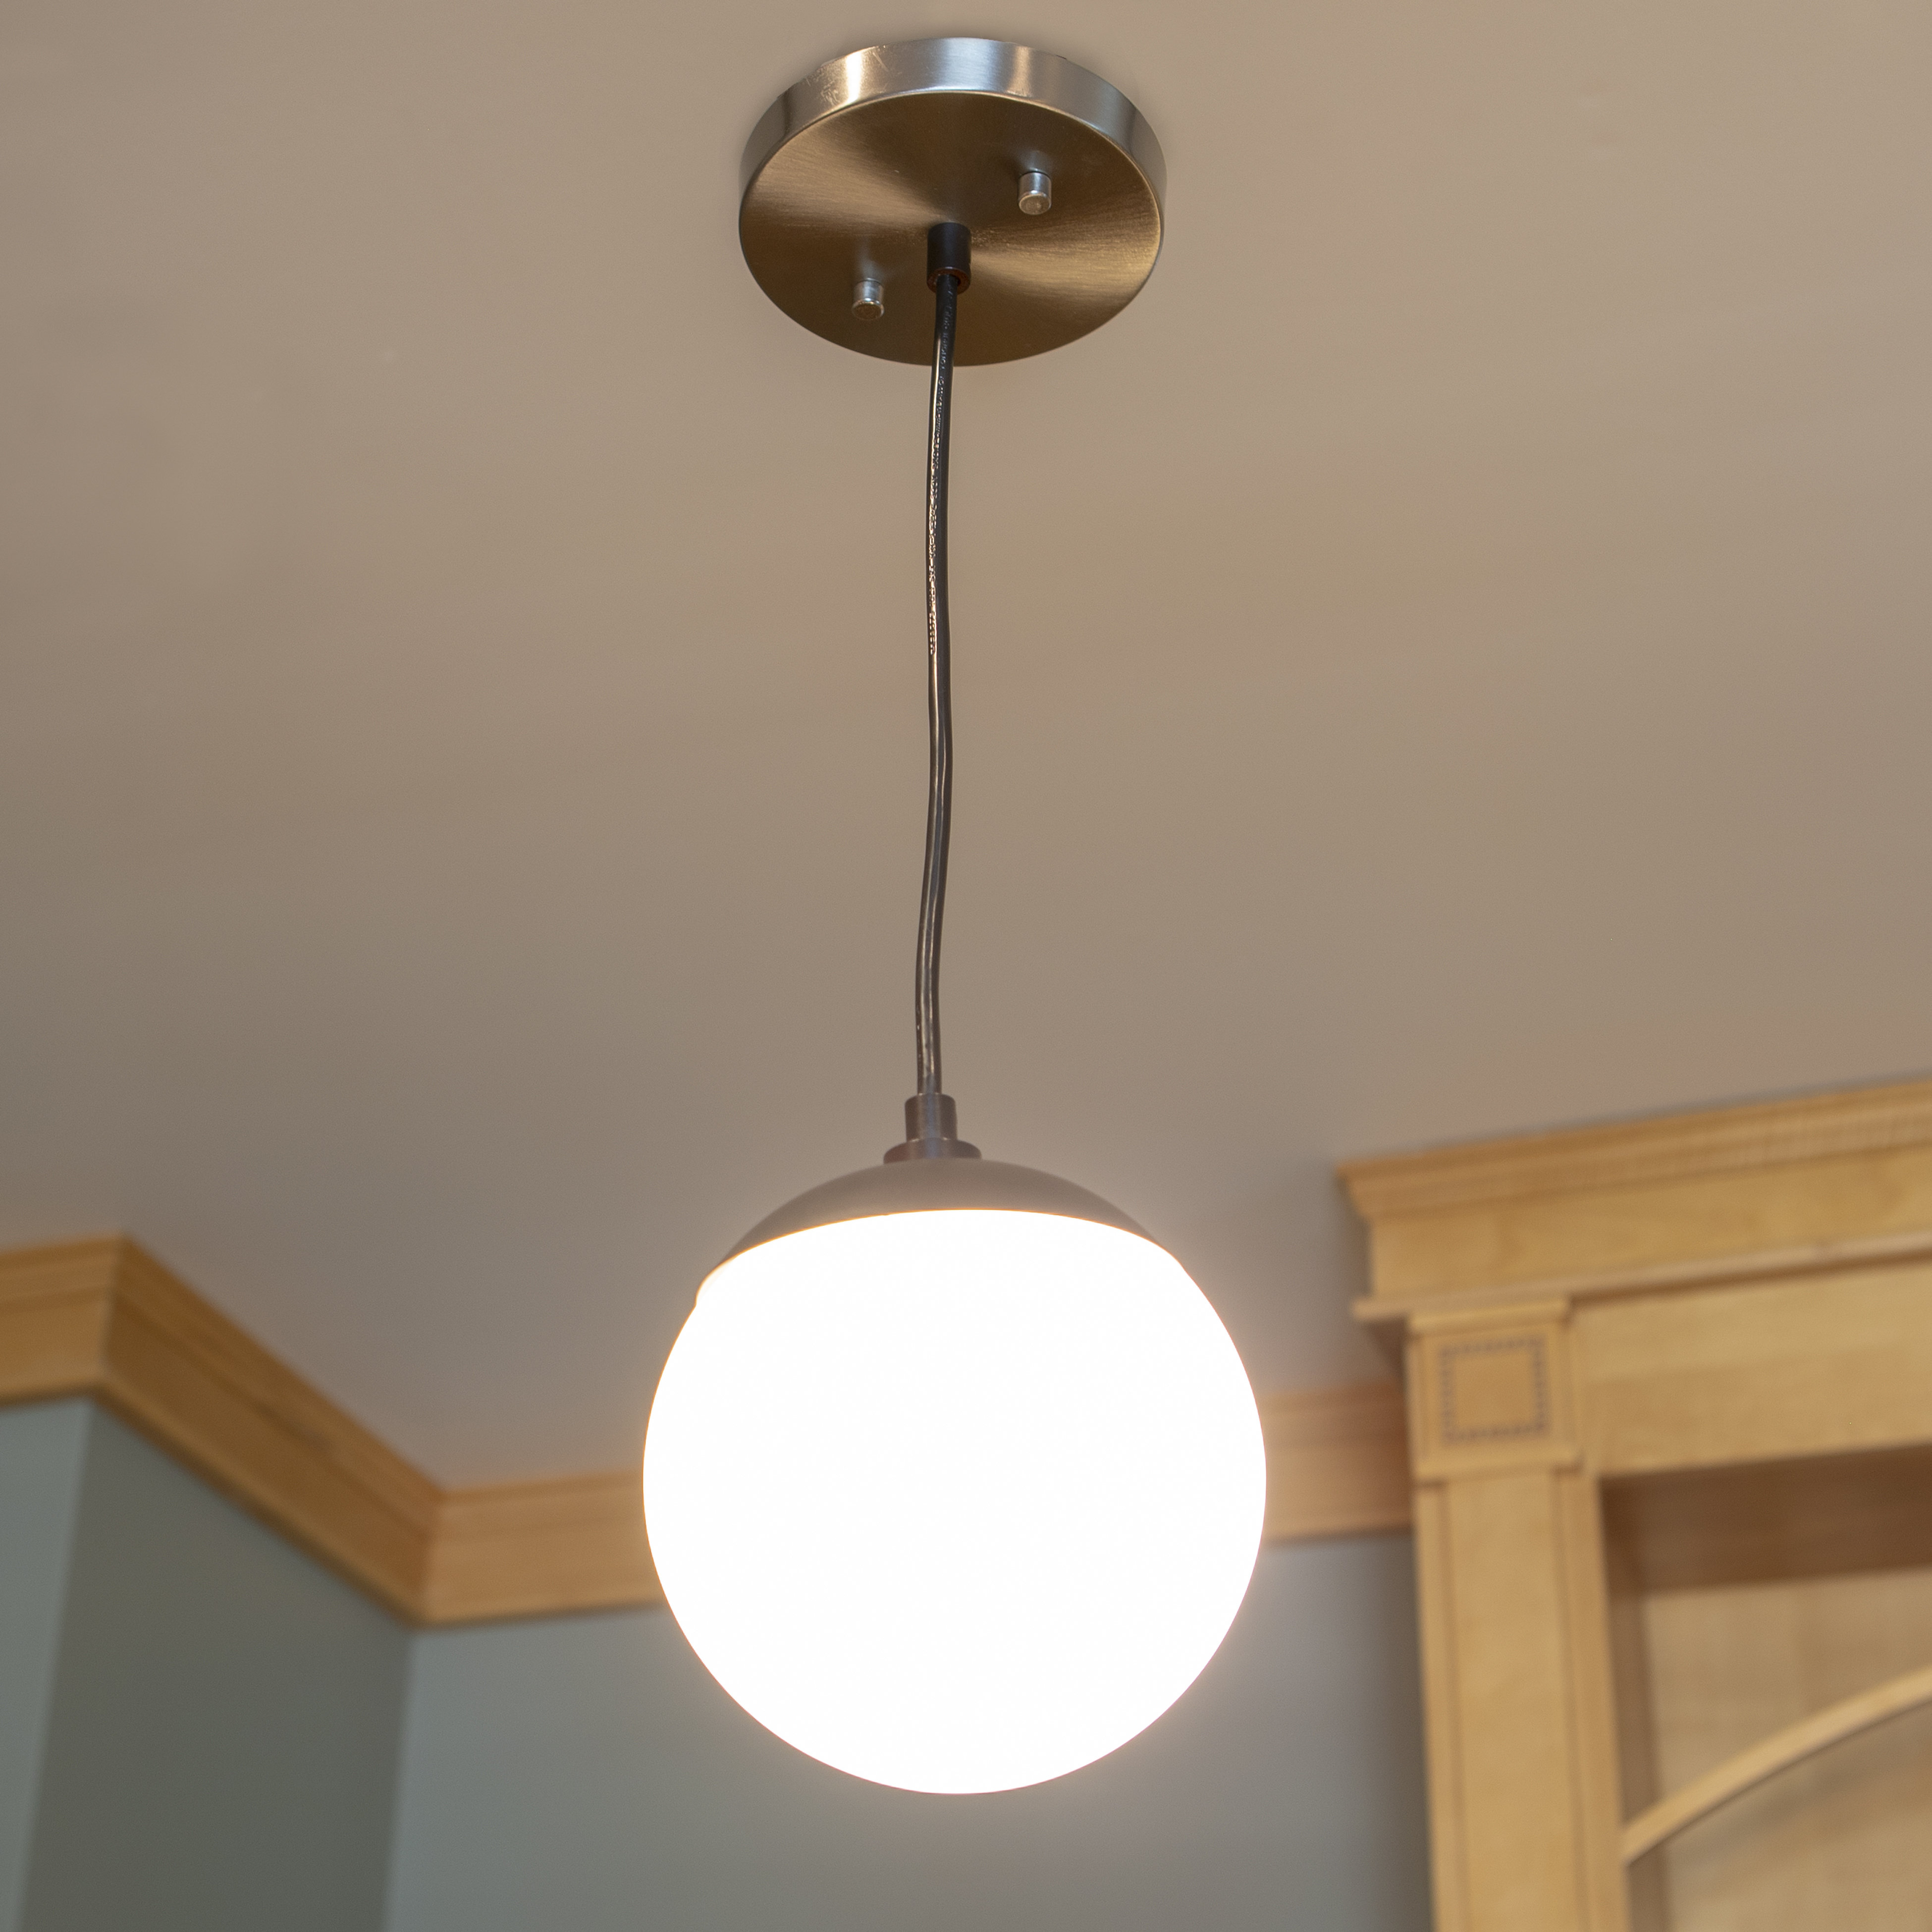 Eckstein 1-Light Globe Pendant with regard to Bautista 1-Light Single Globe Pendants (Image 22 of 30)